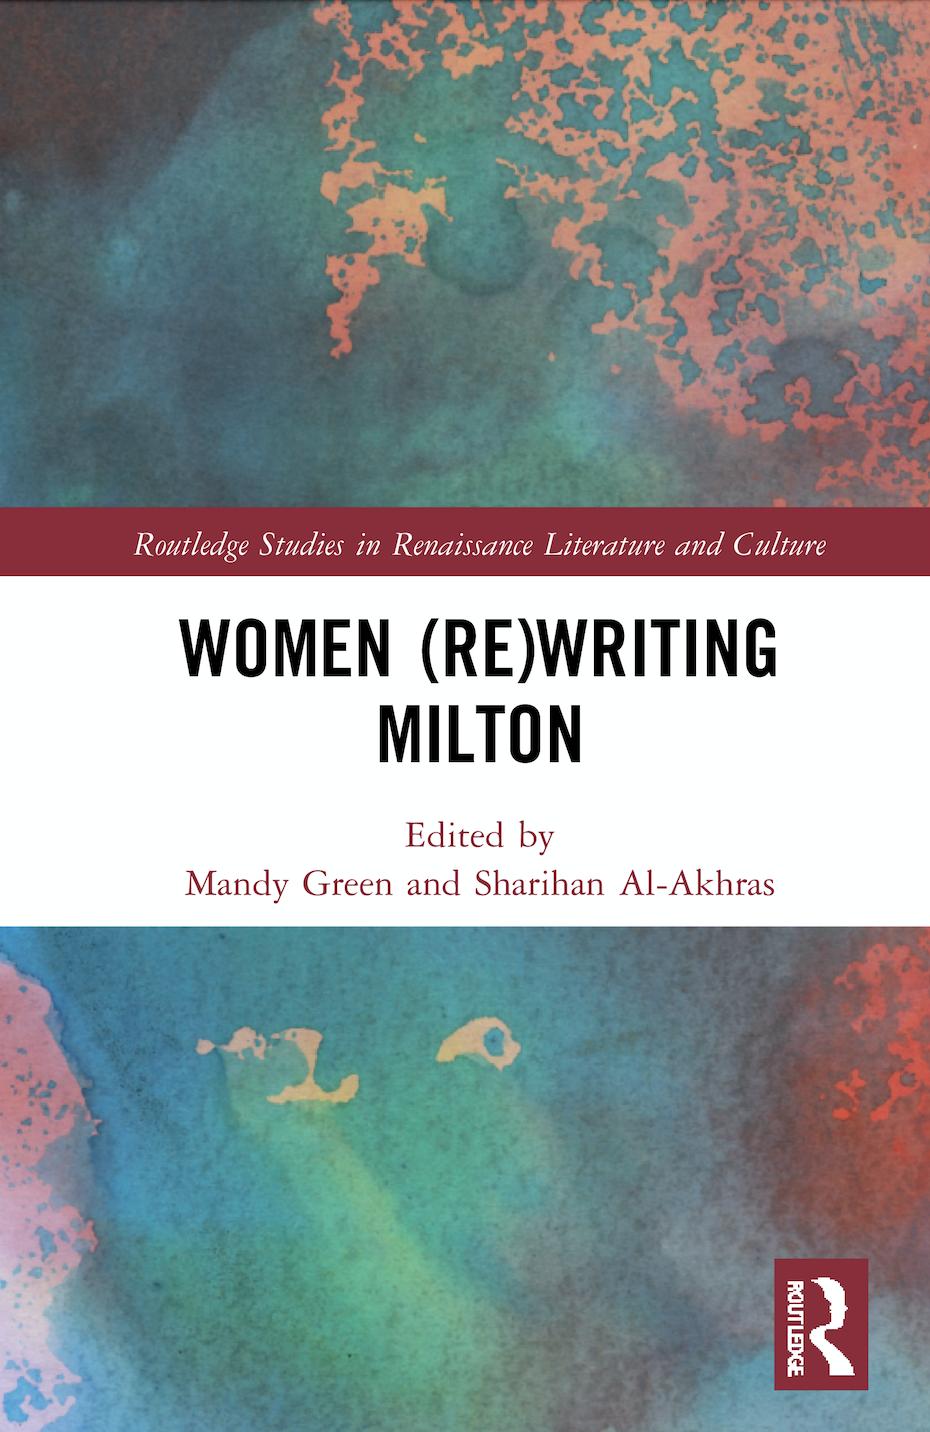 M.Green,S. Al-Akhras (ed.).Women (Re)Writing Milton